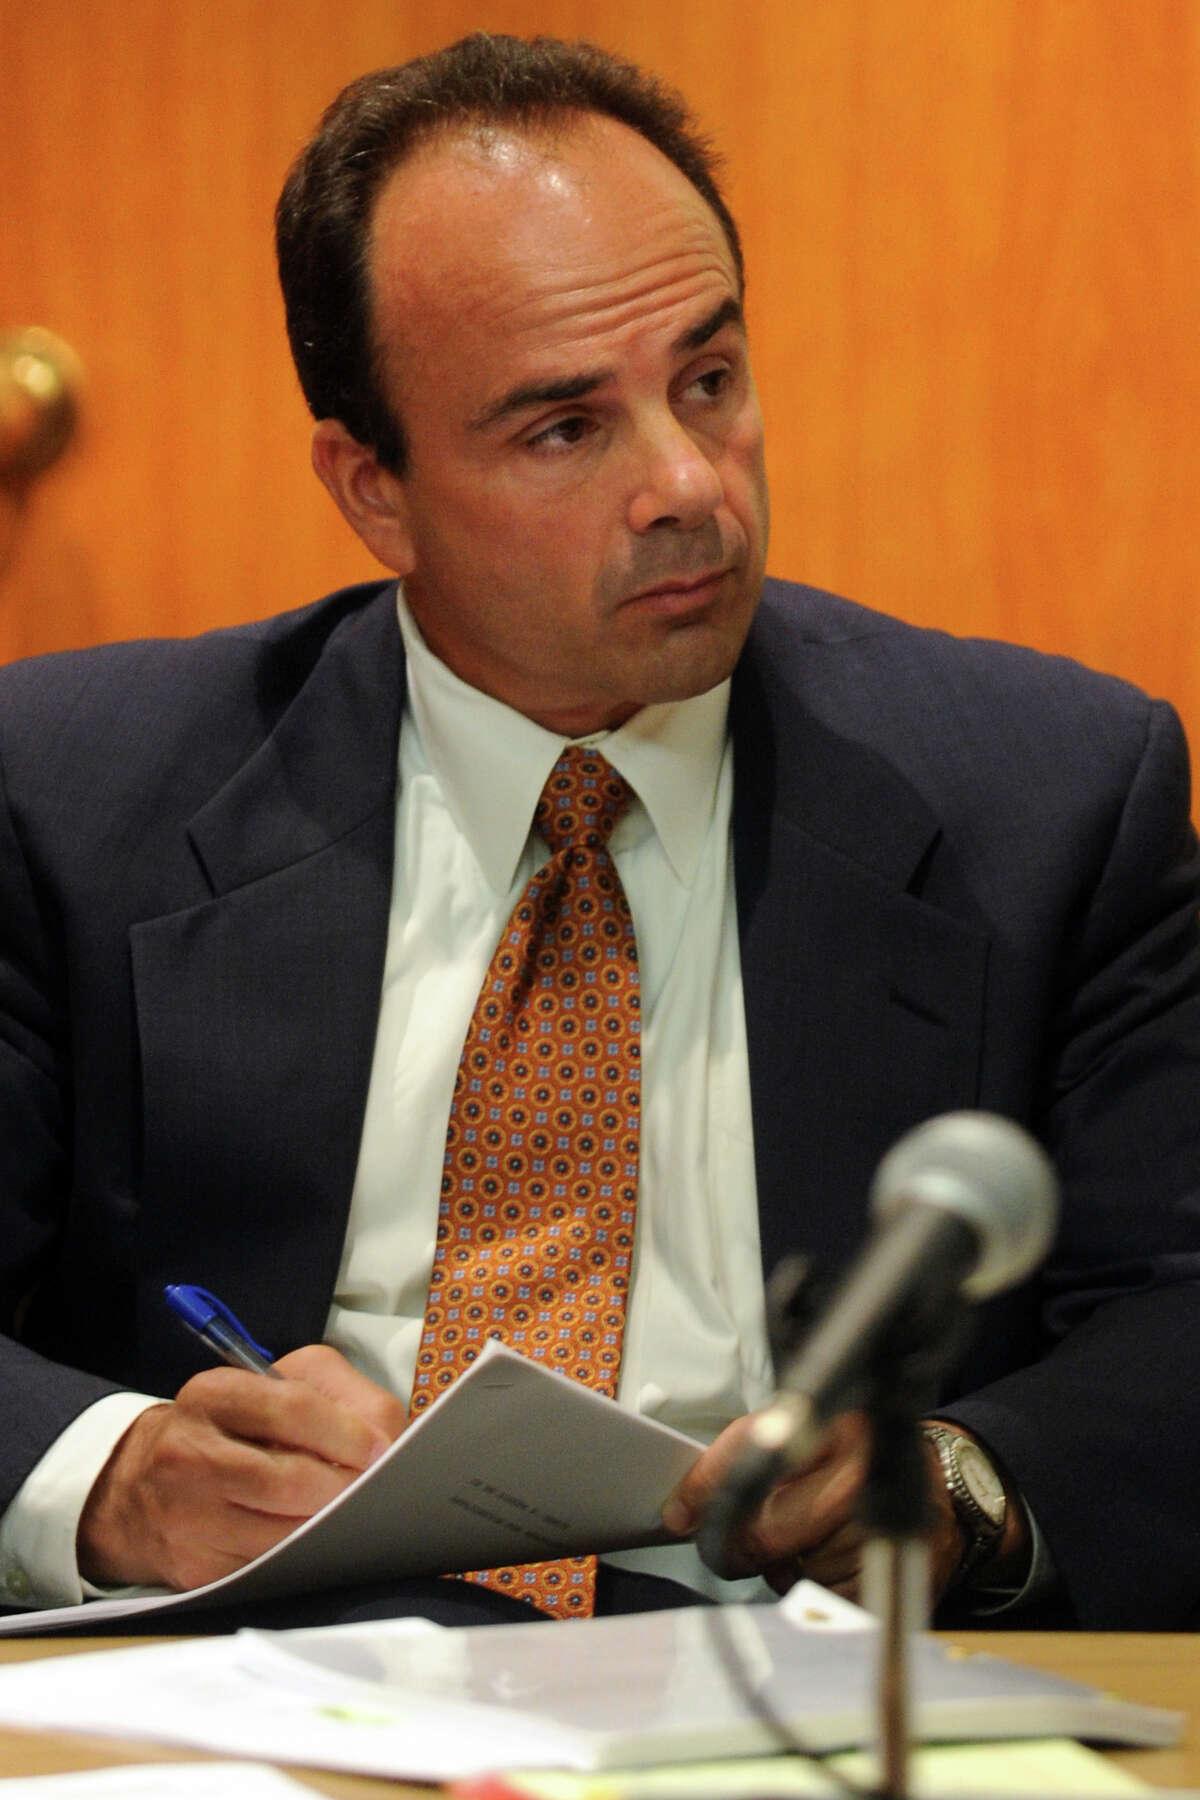 Former Bridgeport Mayor Joseph Ganim in Superior Court, in Bridgeport, Conn. Sept. 11th, 2012.